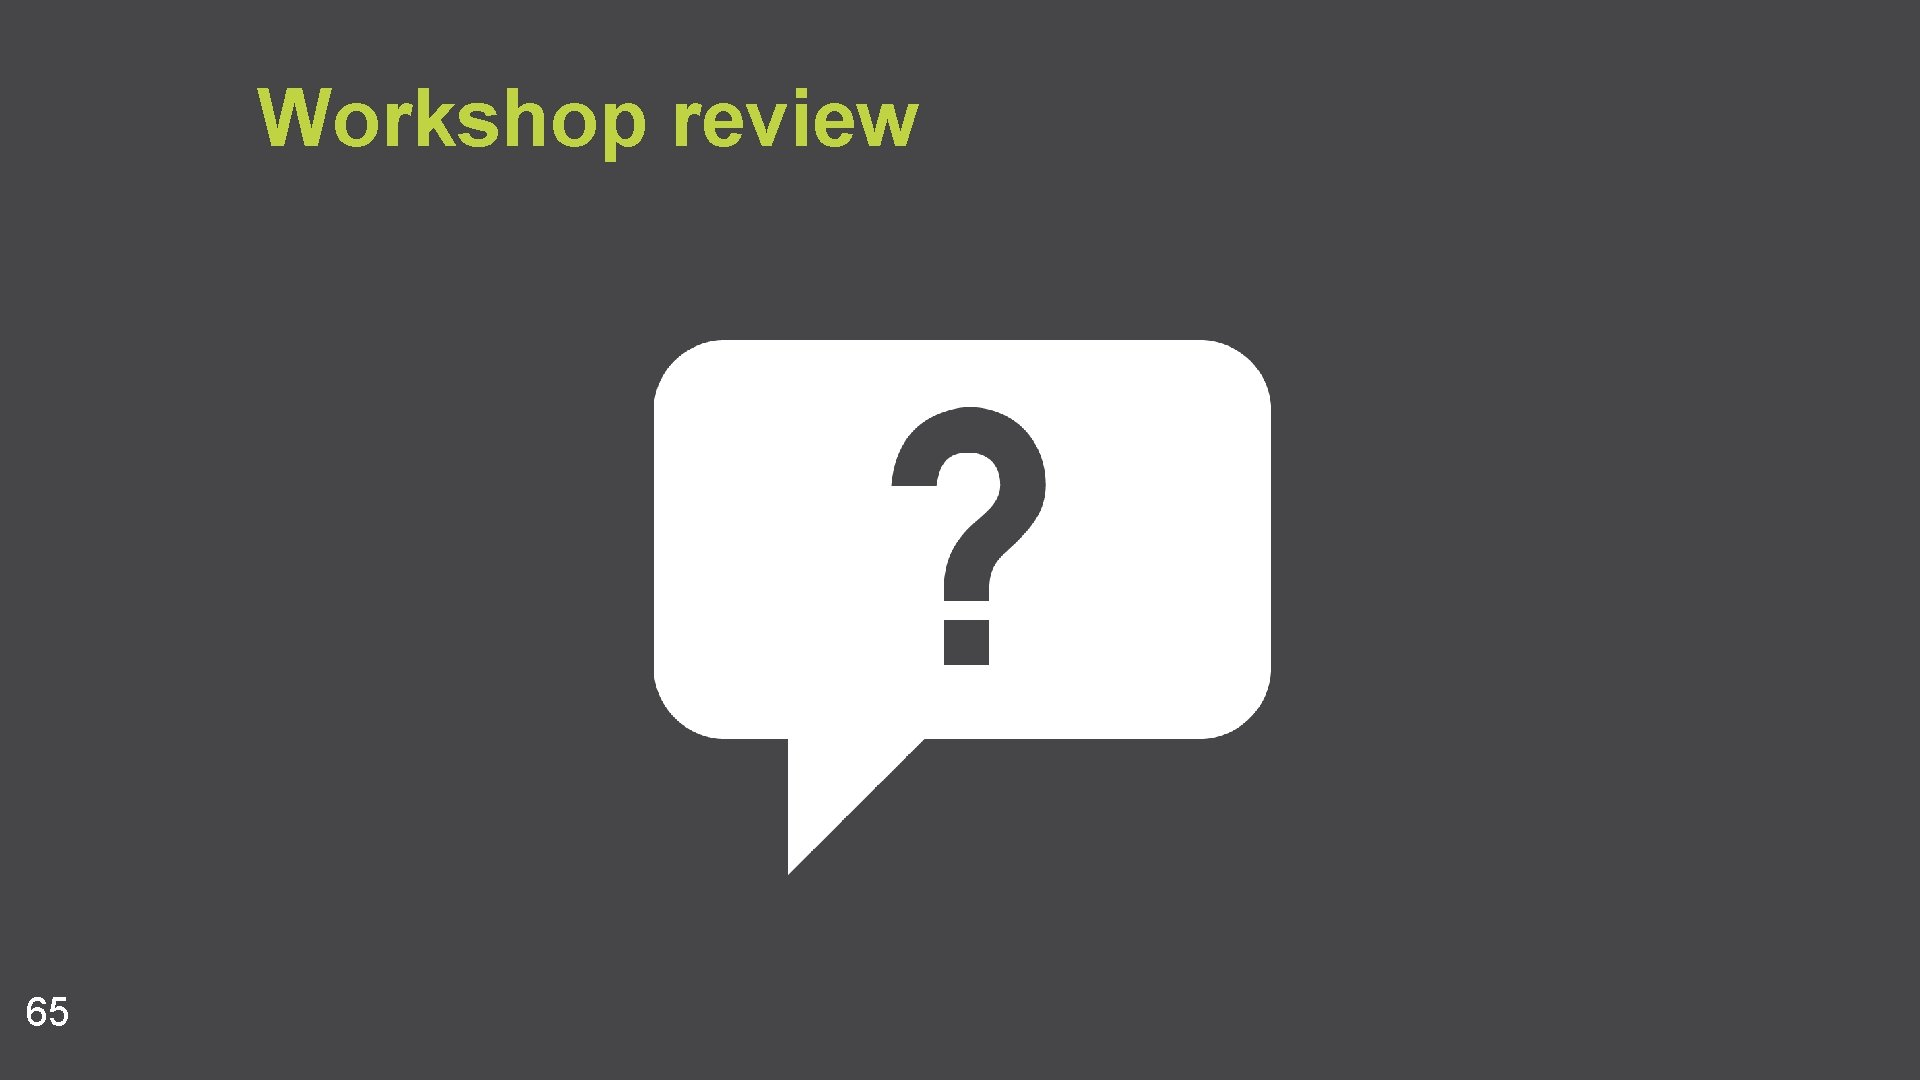 Workshop review 65